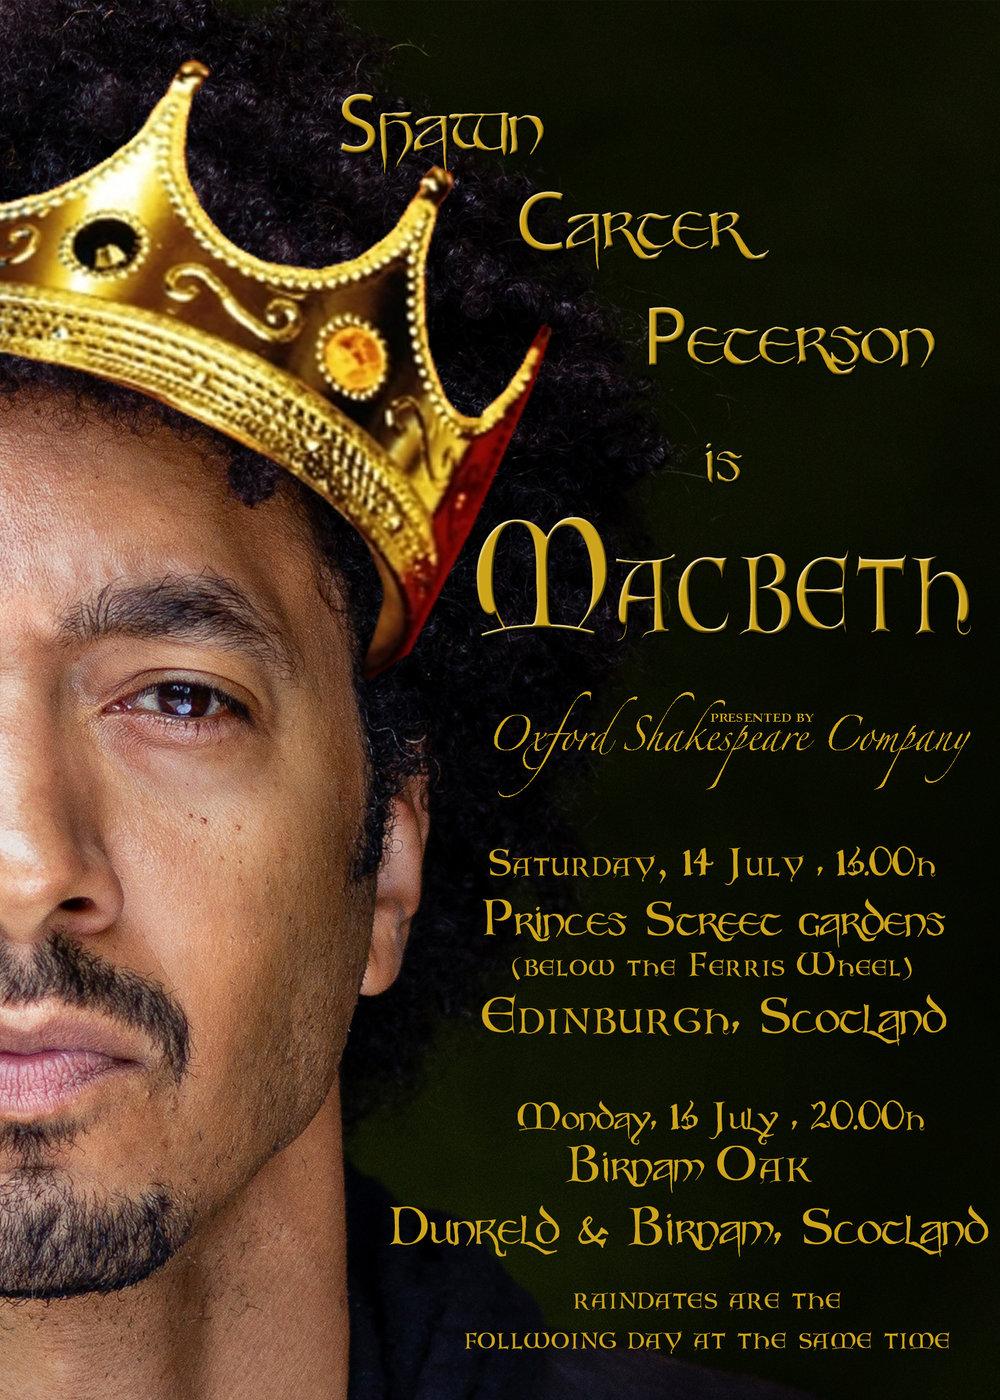 SCP is Macbeth!